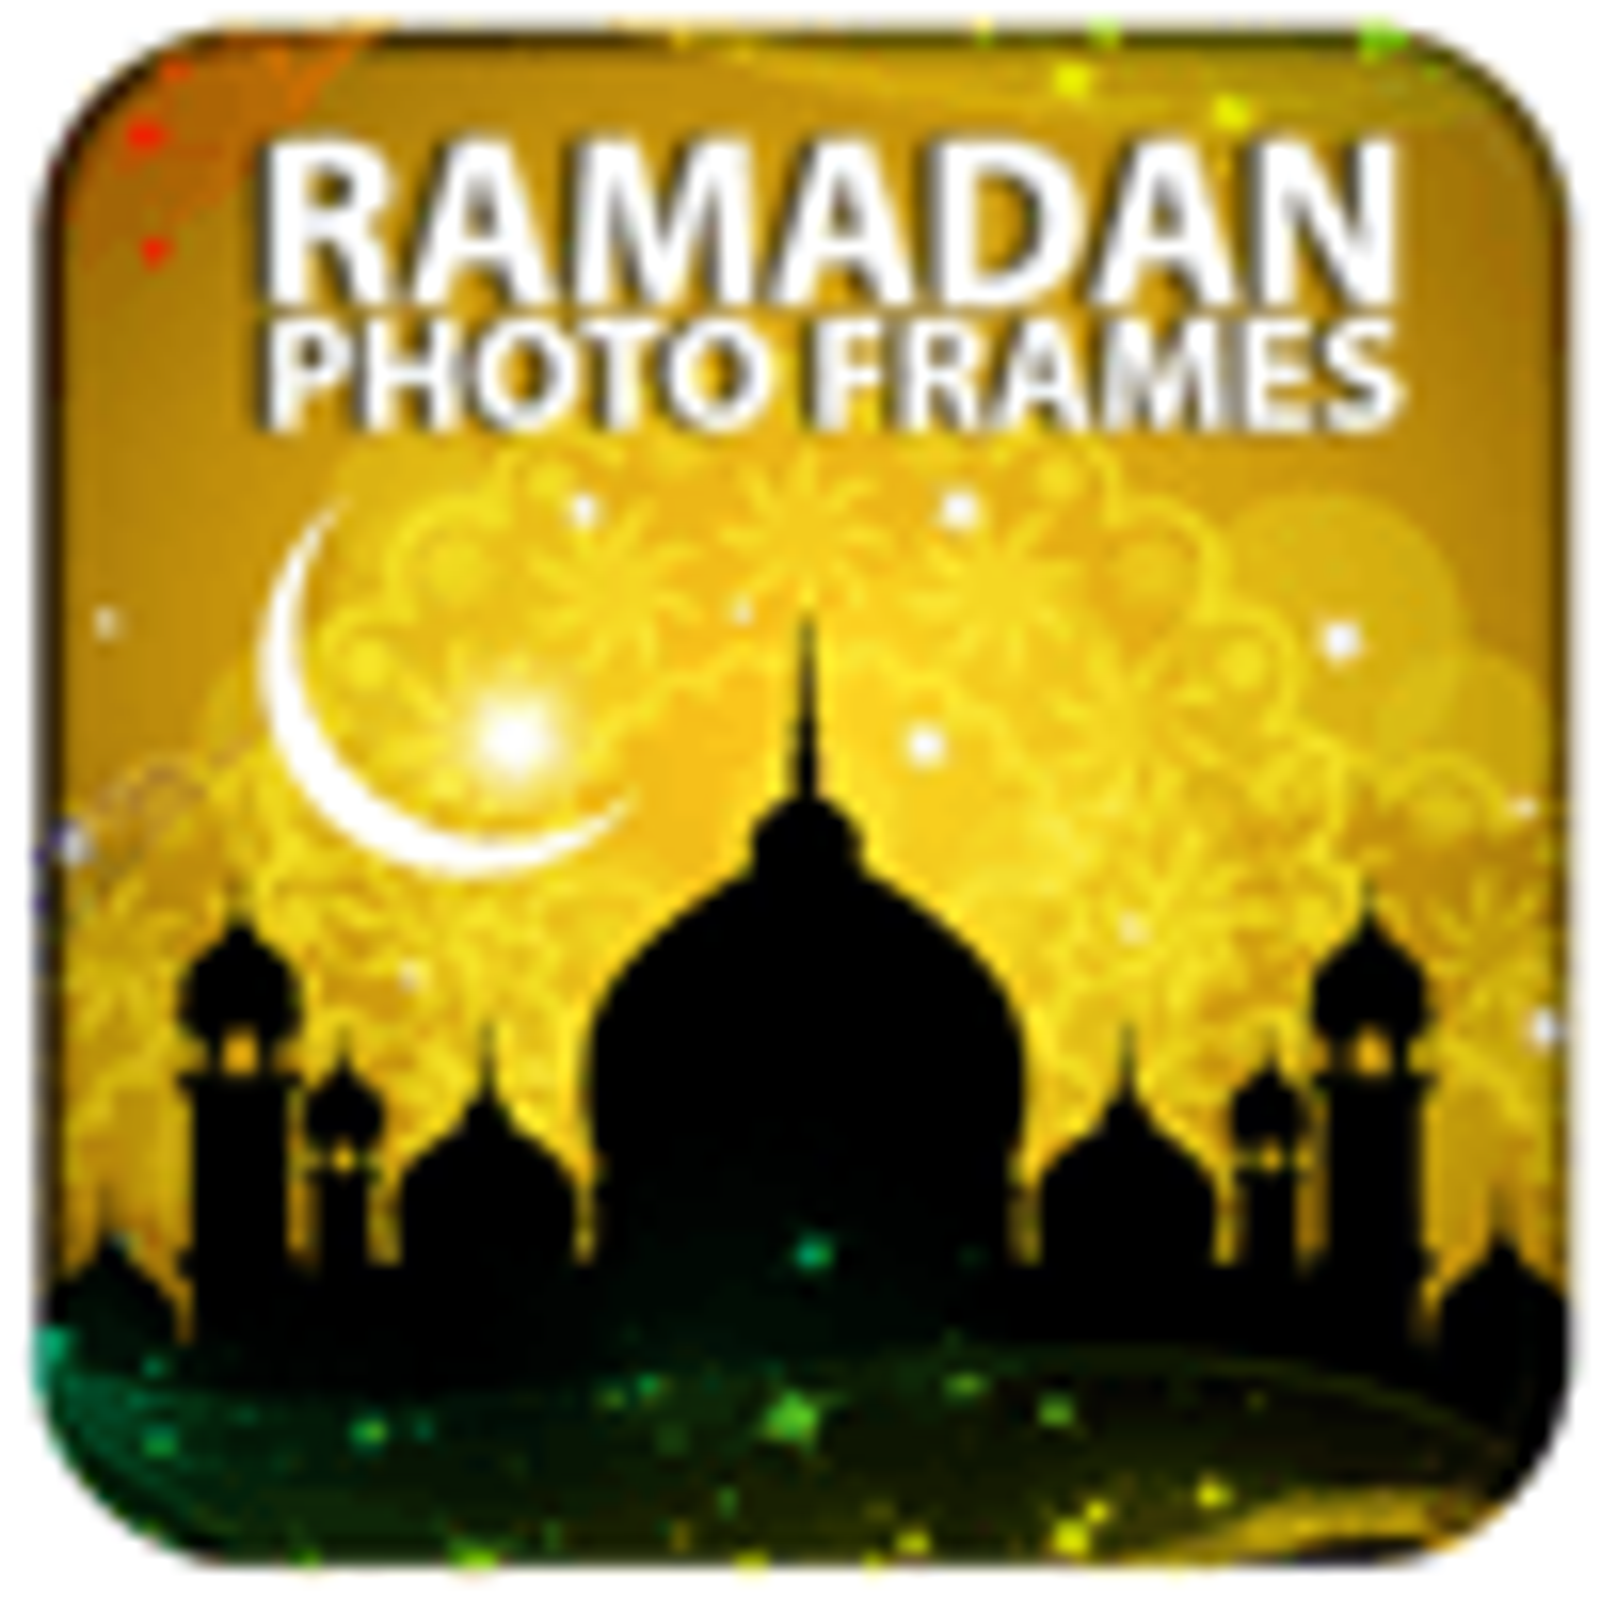 Ramadan Photo Frames 2015